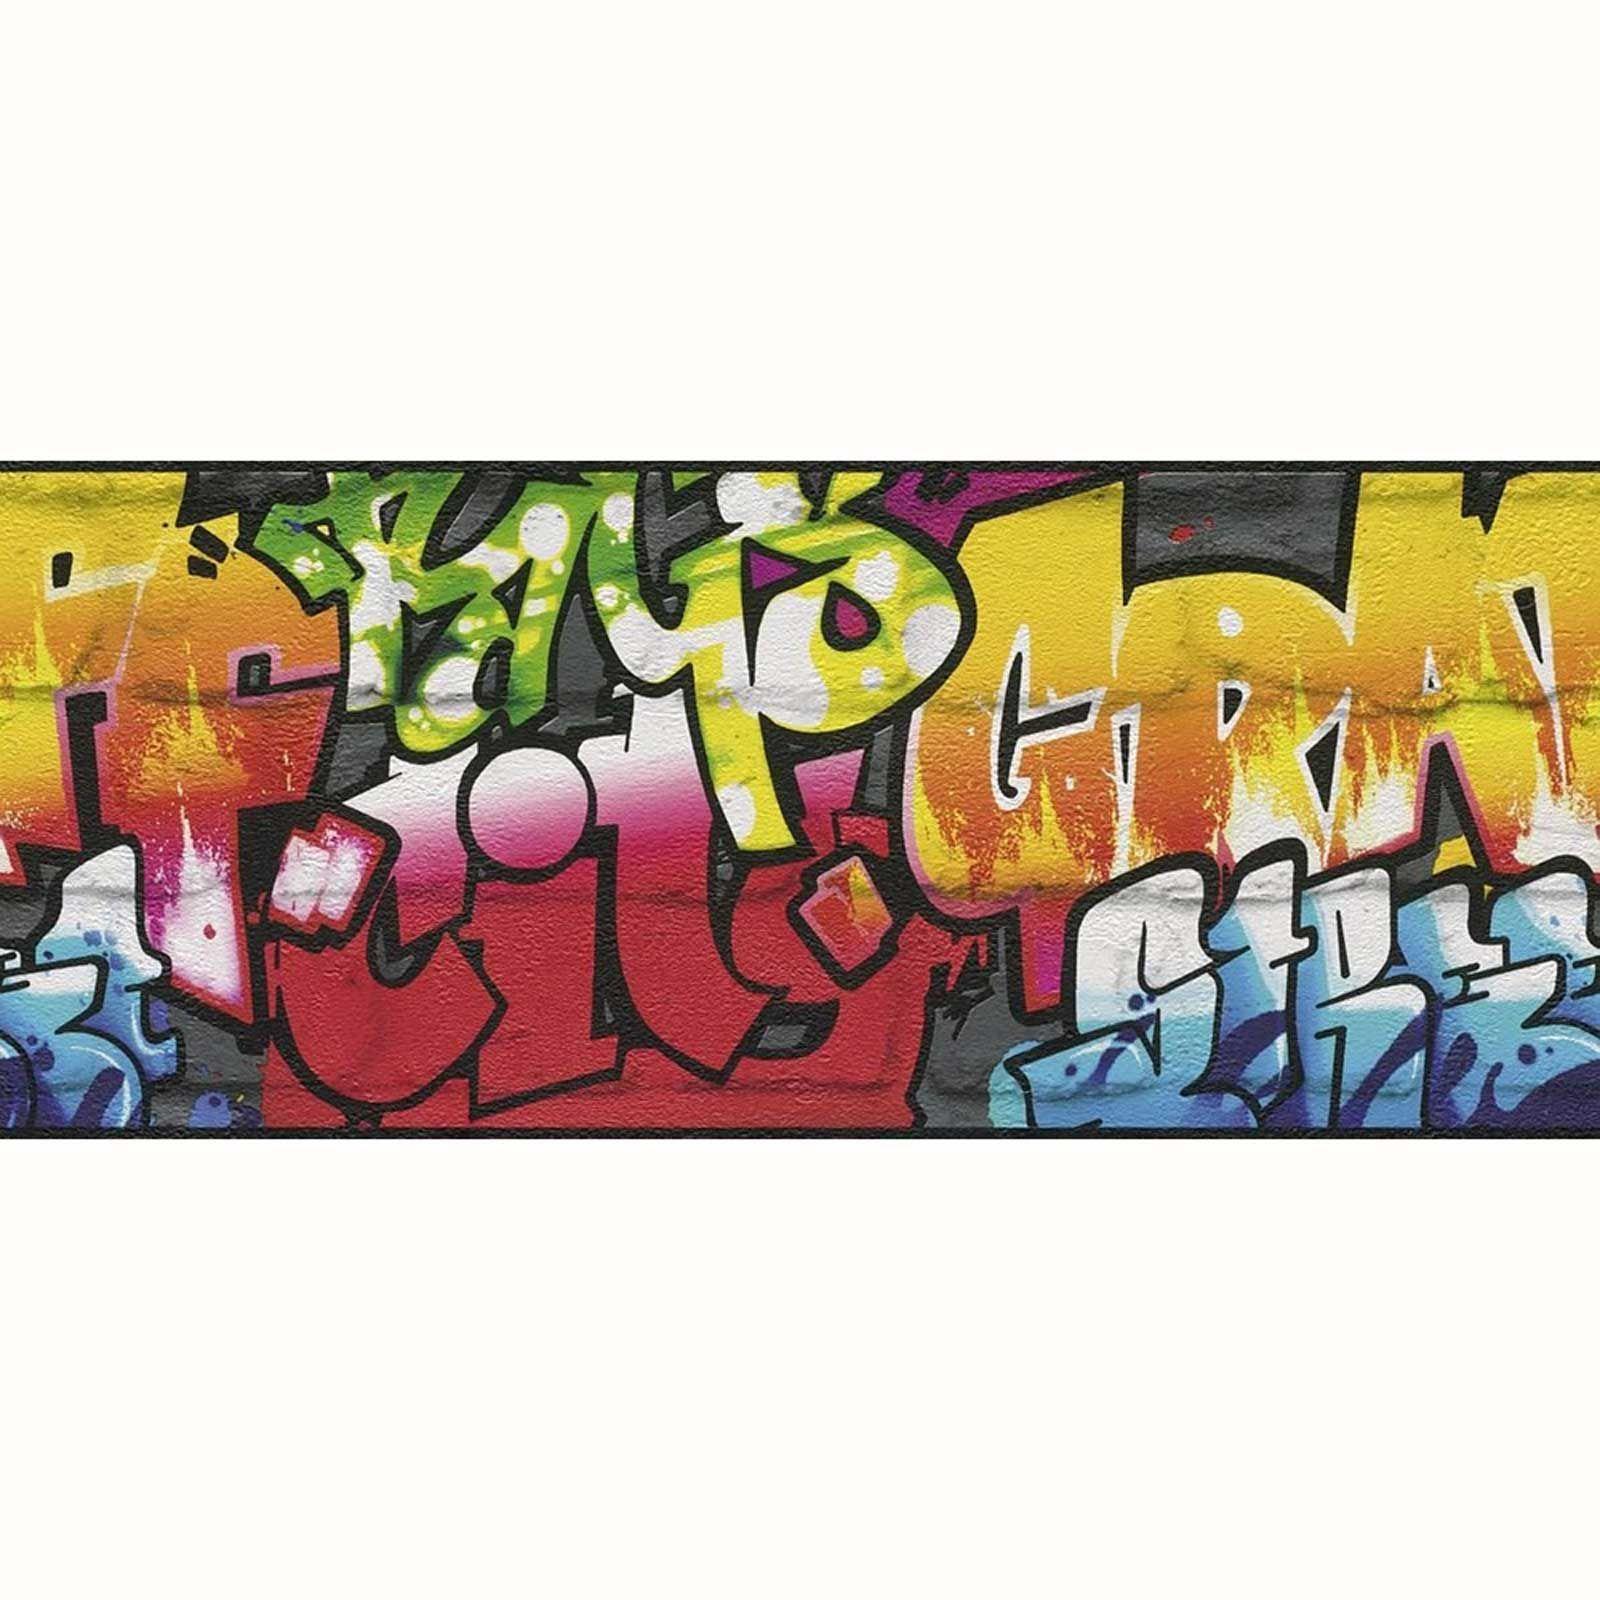 Details about BLACK GRAFFITI WALLPAPER BORDERS   RASCH 237900   NEW 1600x1600